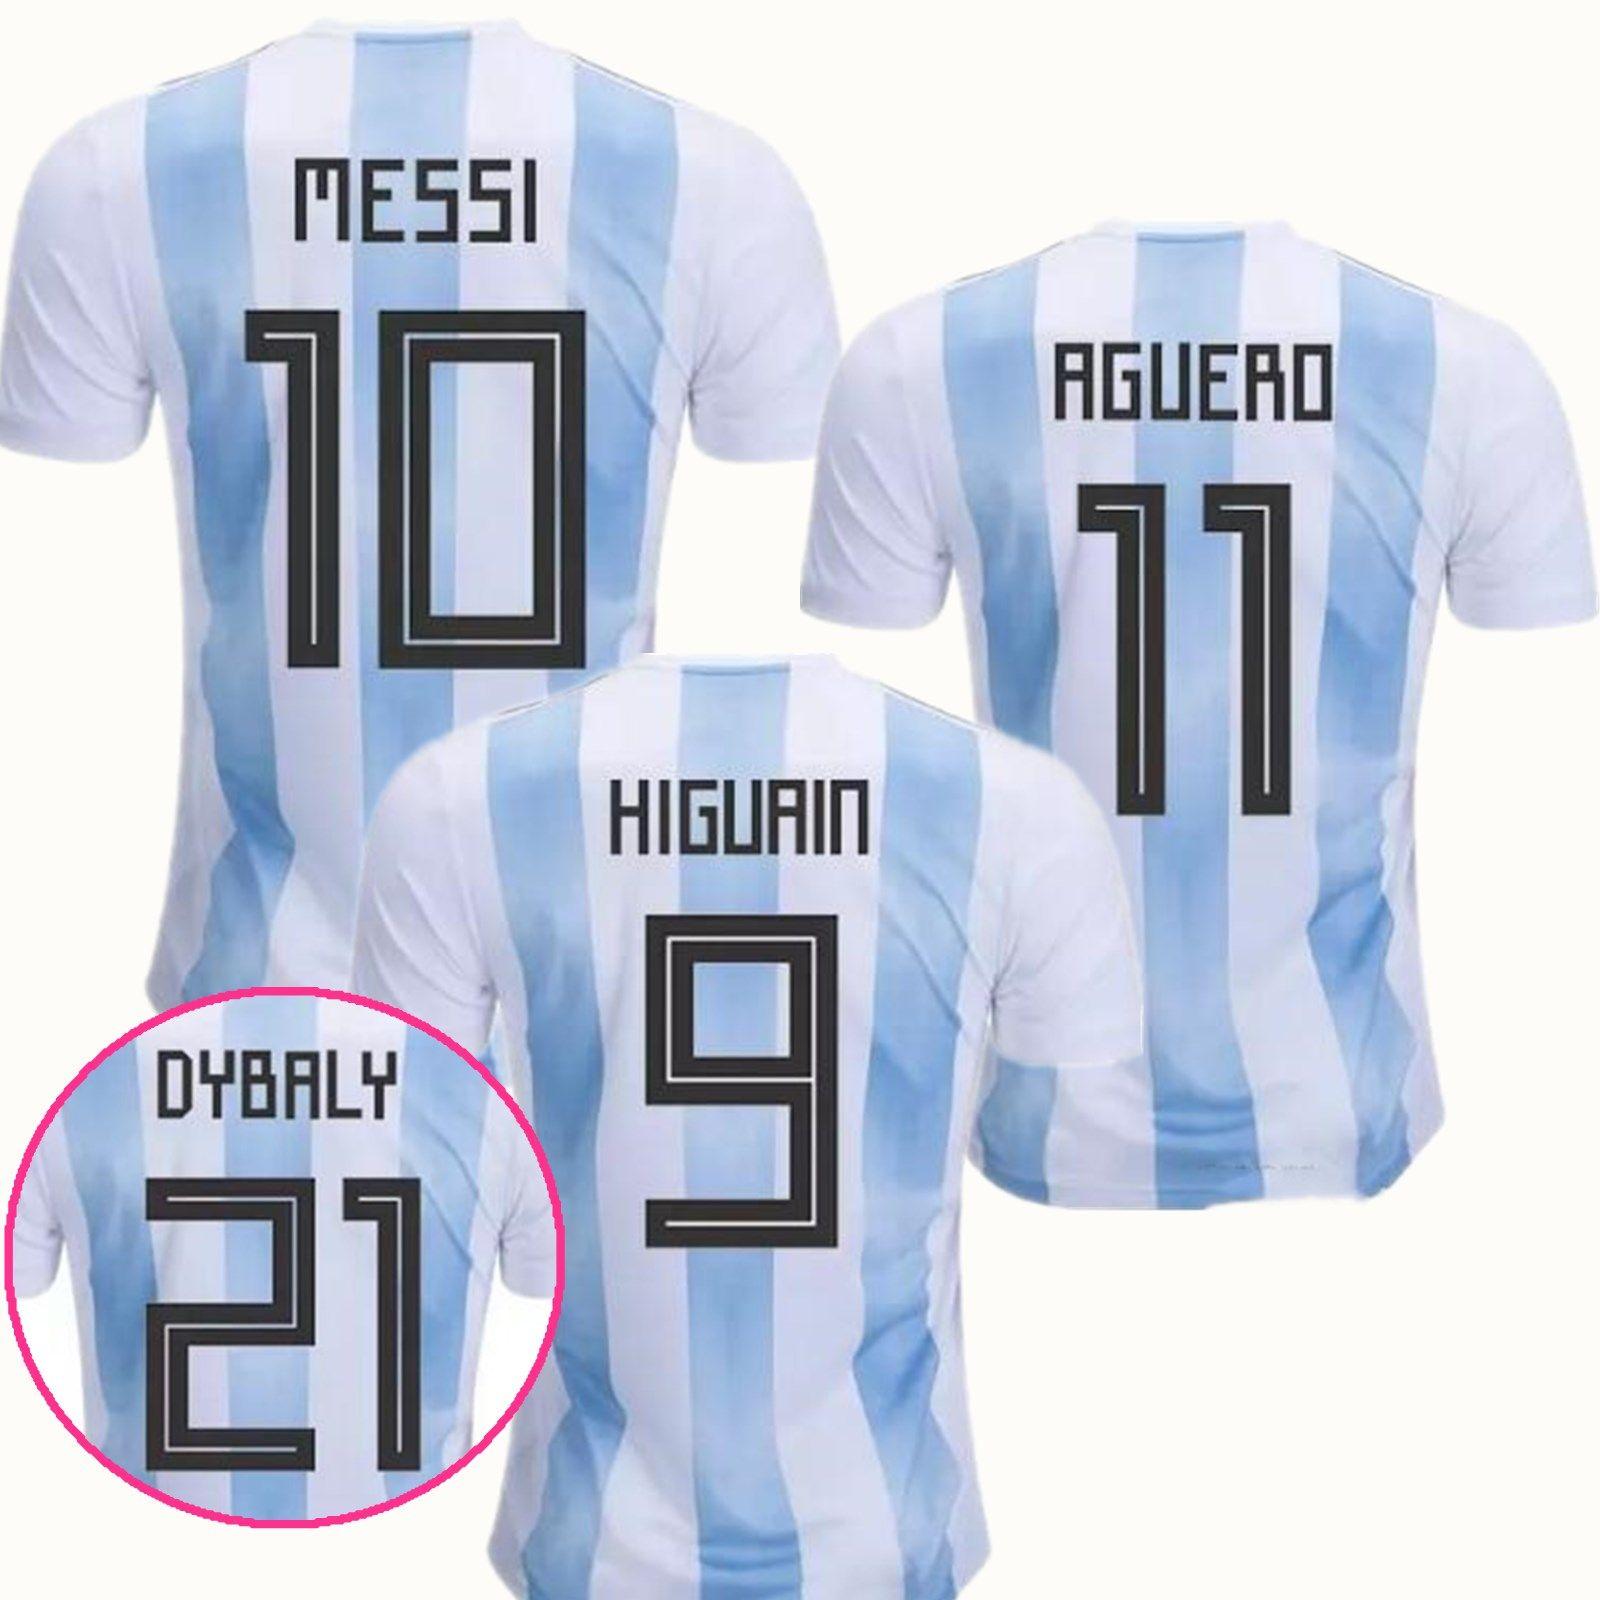 158070bc132269 2019 2018 Argentina World Cup Jersey 10 MESSI DI MARIA AGUERO KOMPANY  DYBALA Higuain Home Blue Away Adults Argentina Soccer Jersey Football Shirt  From ...